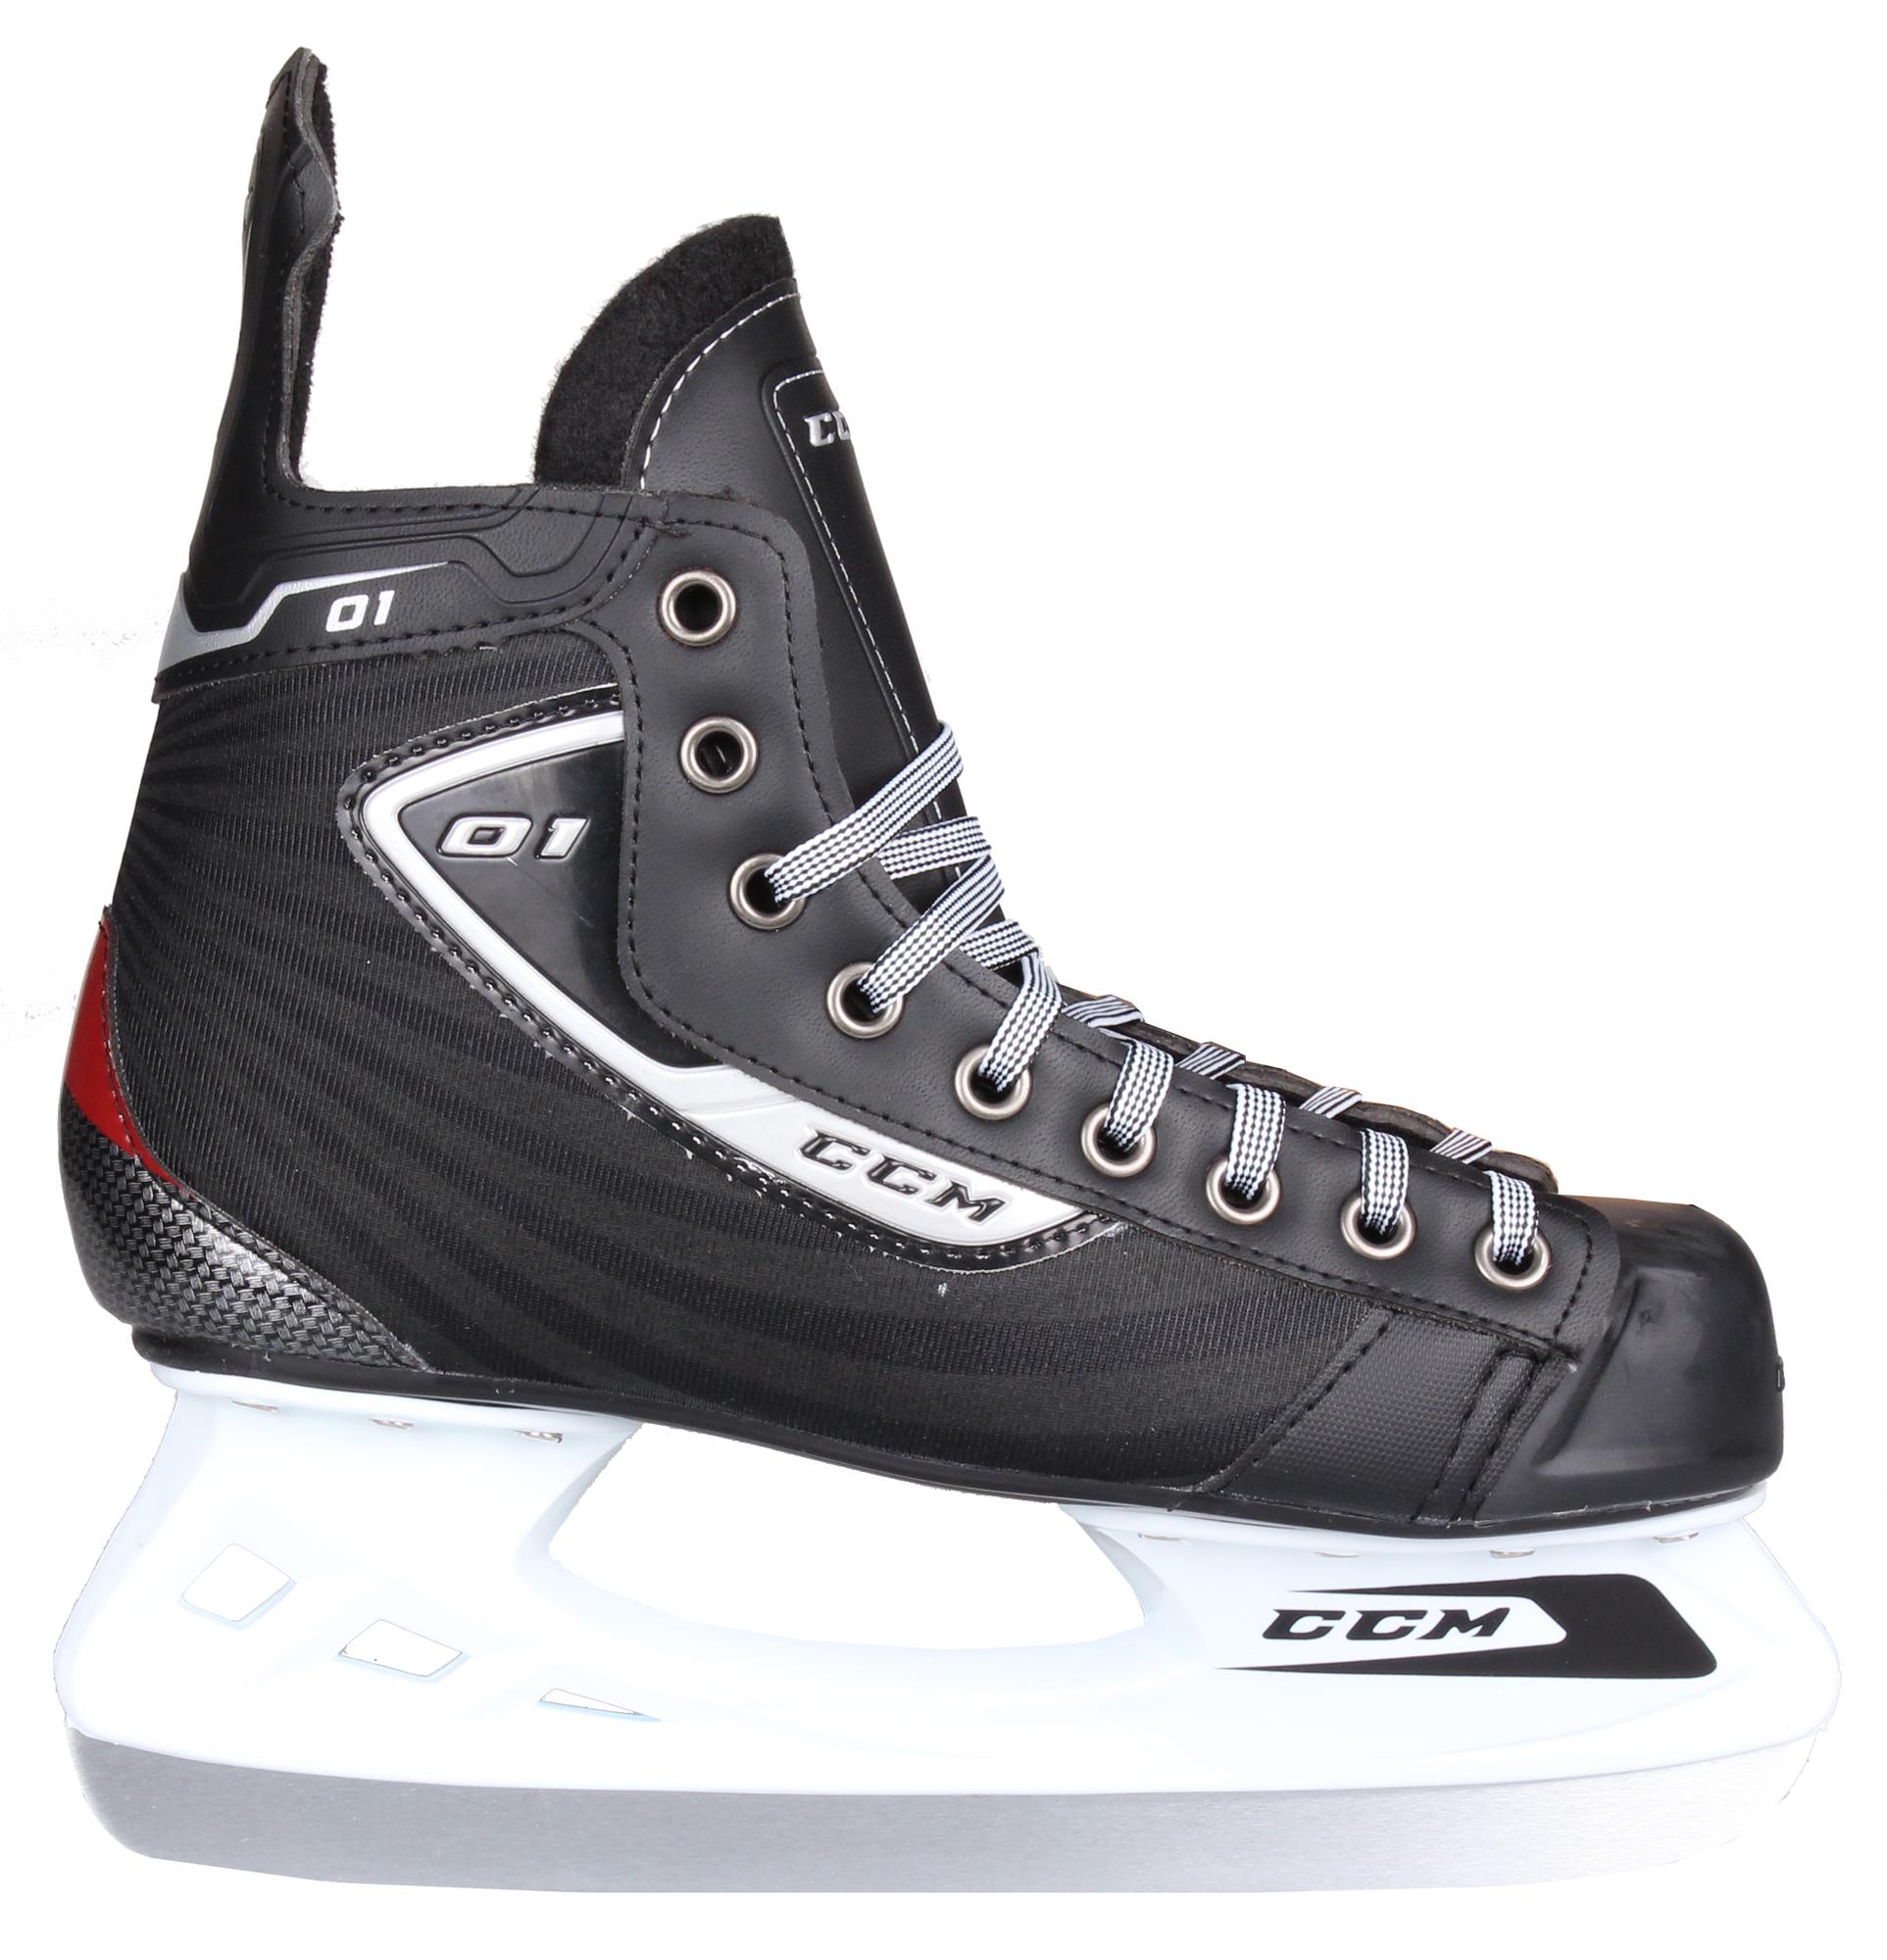 CCM U+ 01 SR hokejové brusle